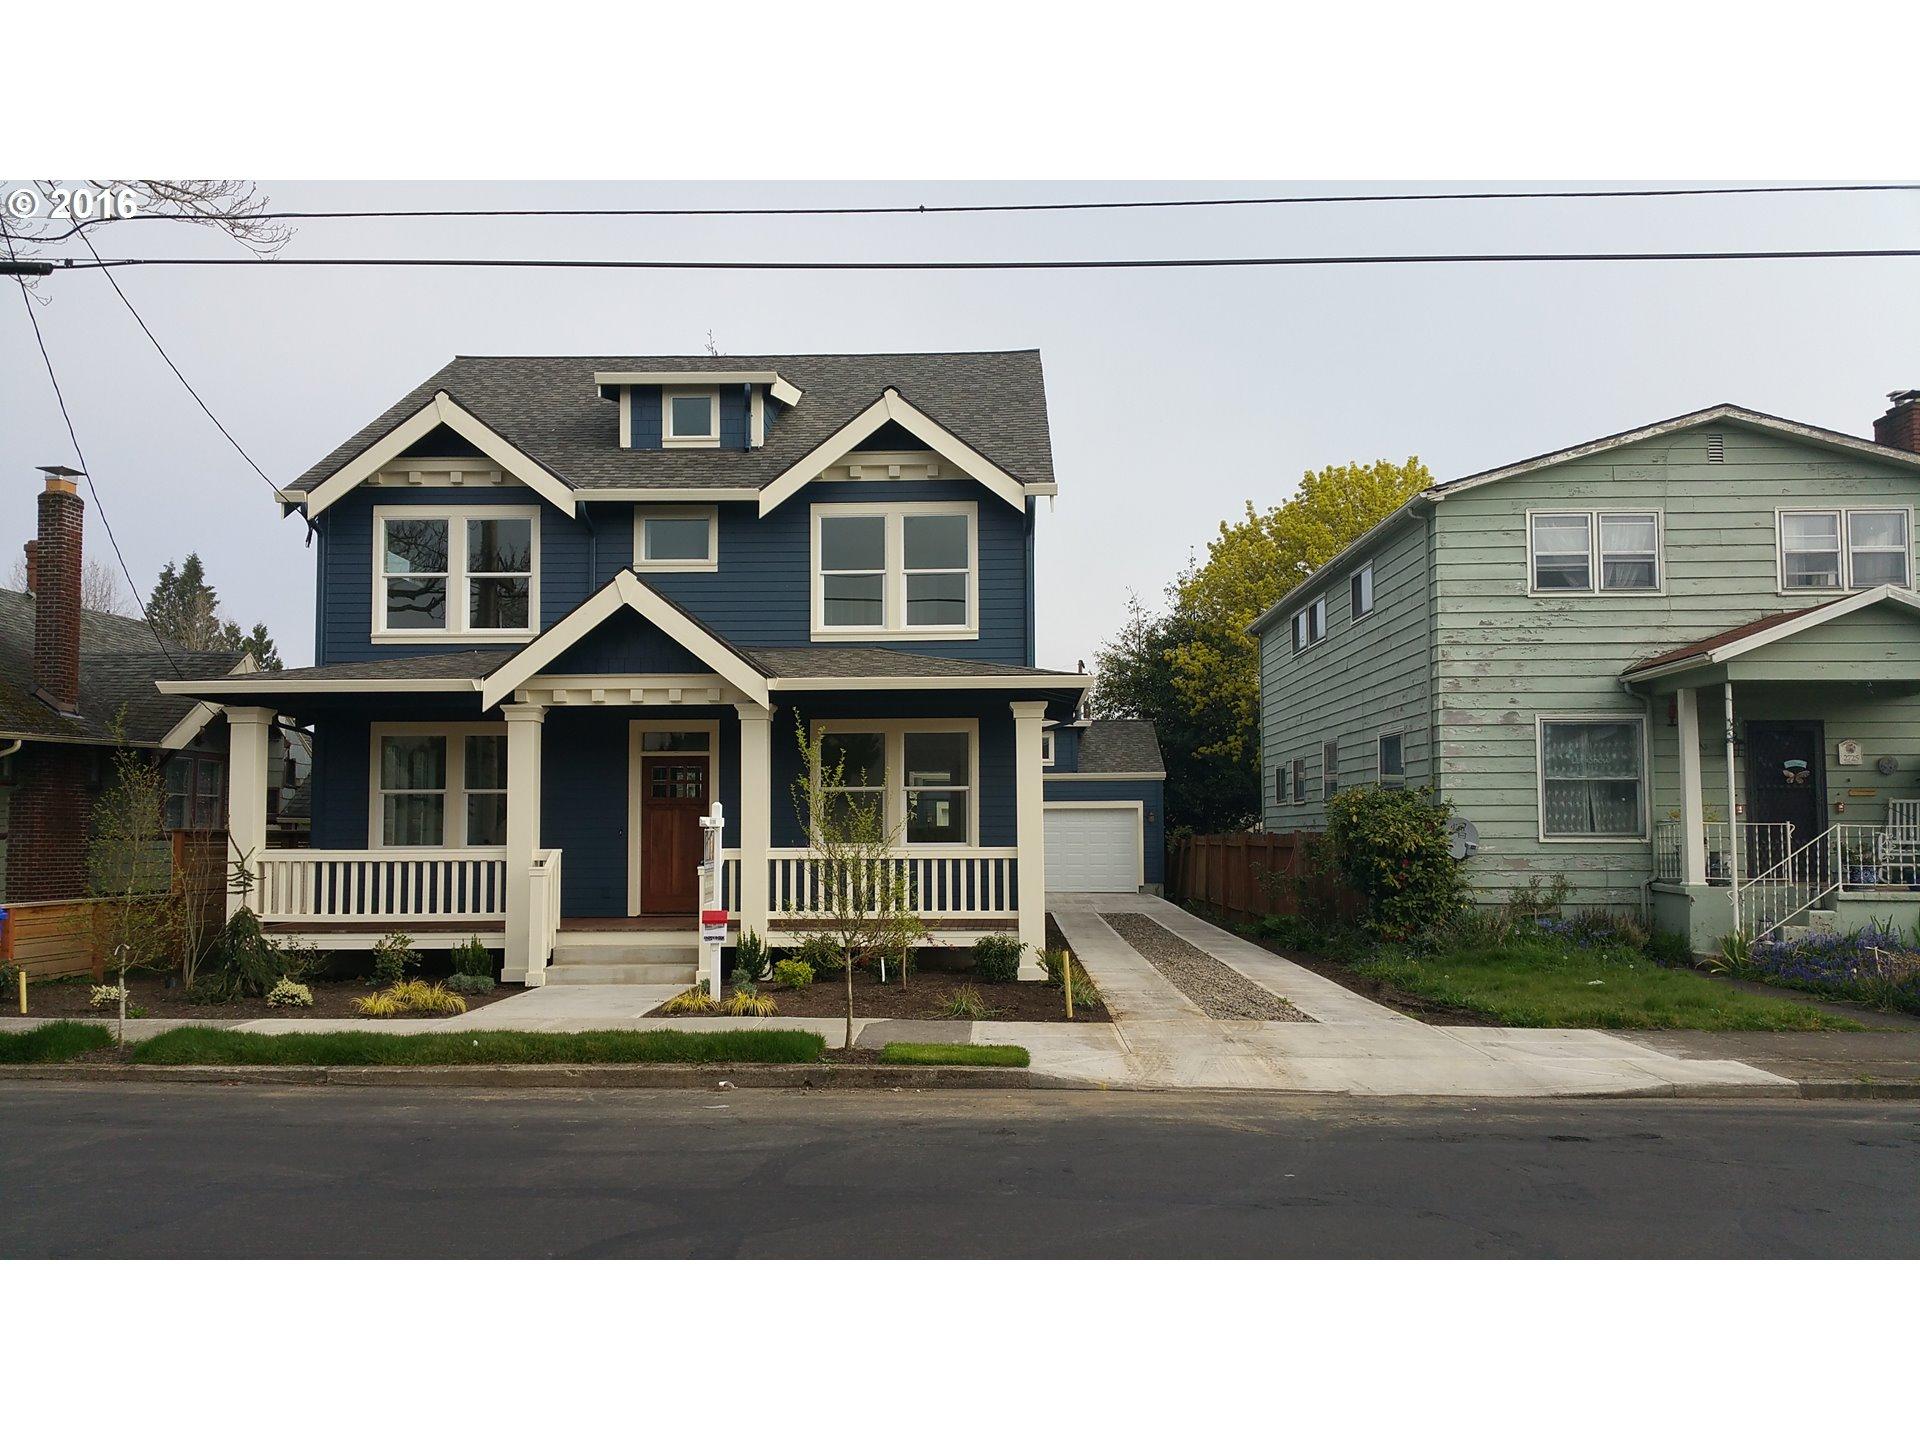 2801 N RUSSET ST, Portland, OR 97217